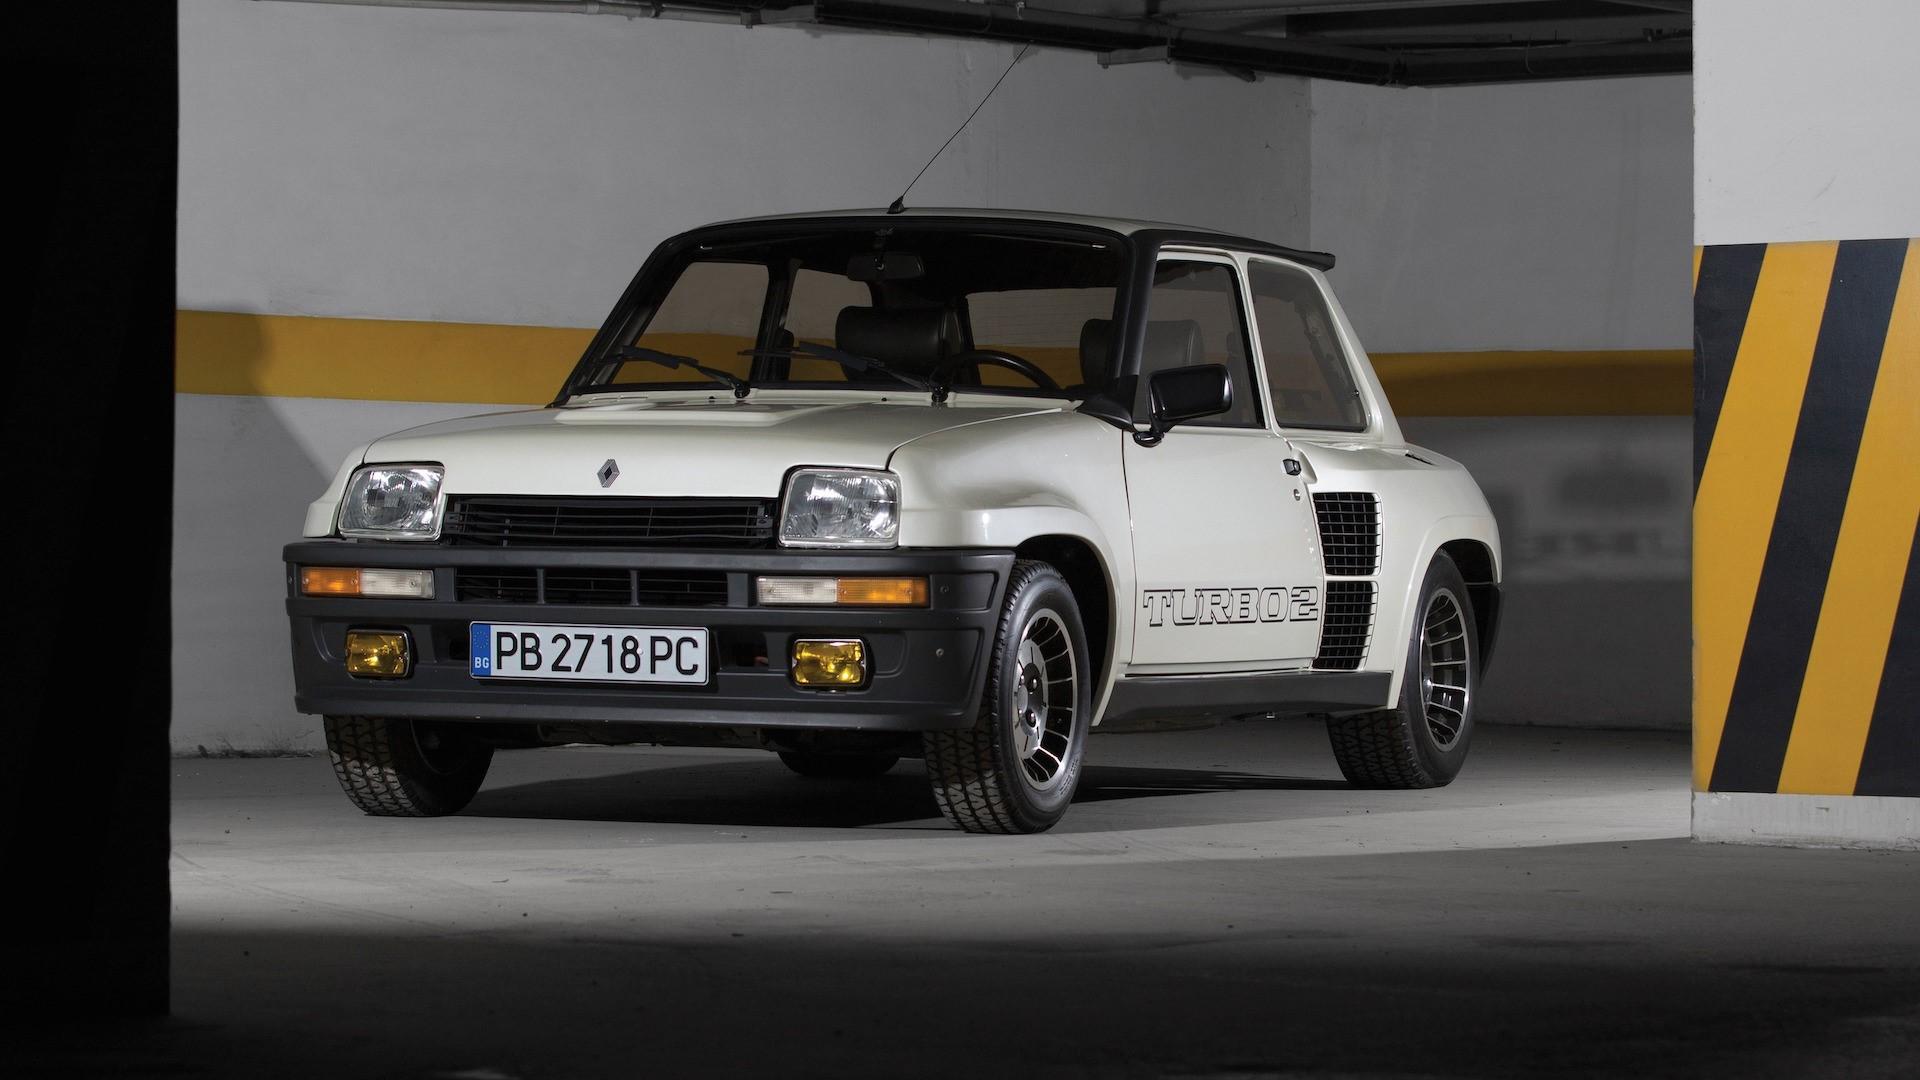 1983-renault-5-turbo-ii-auction